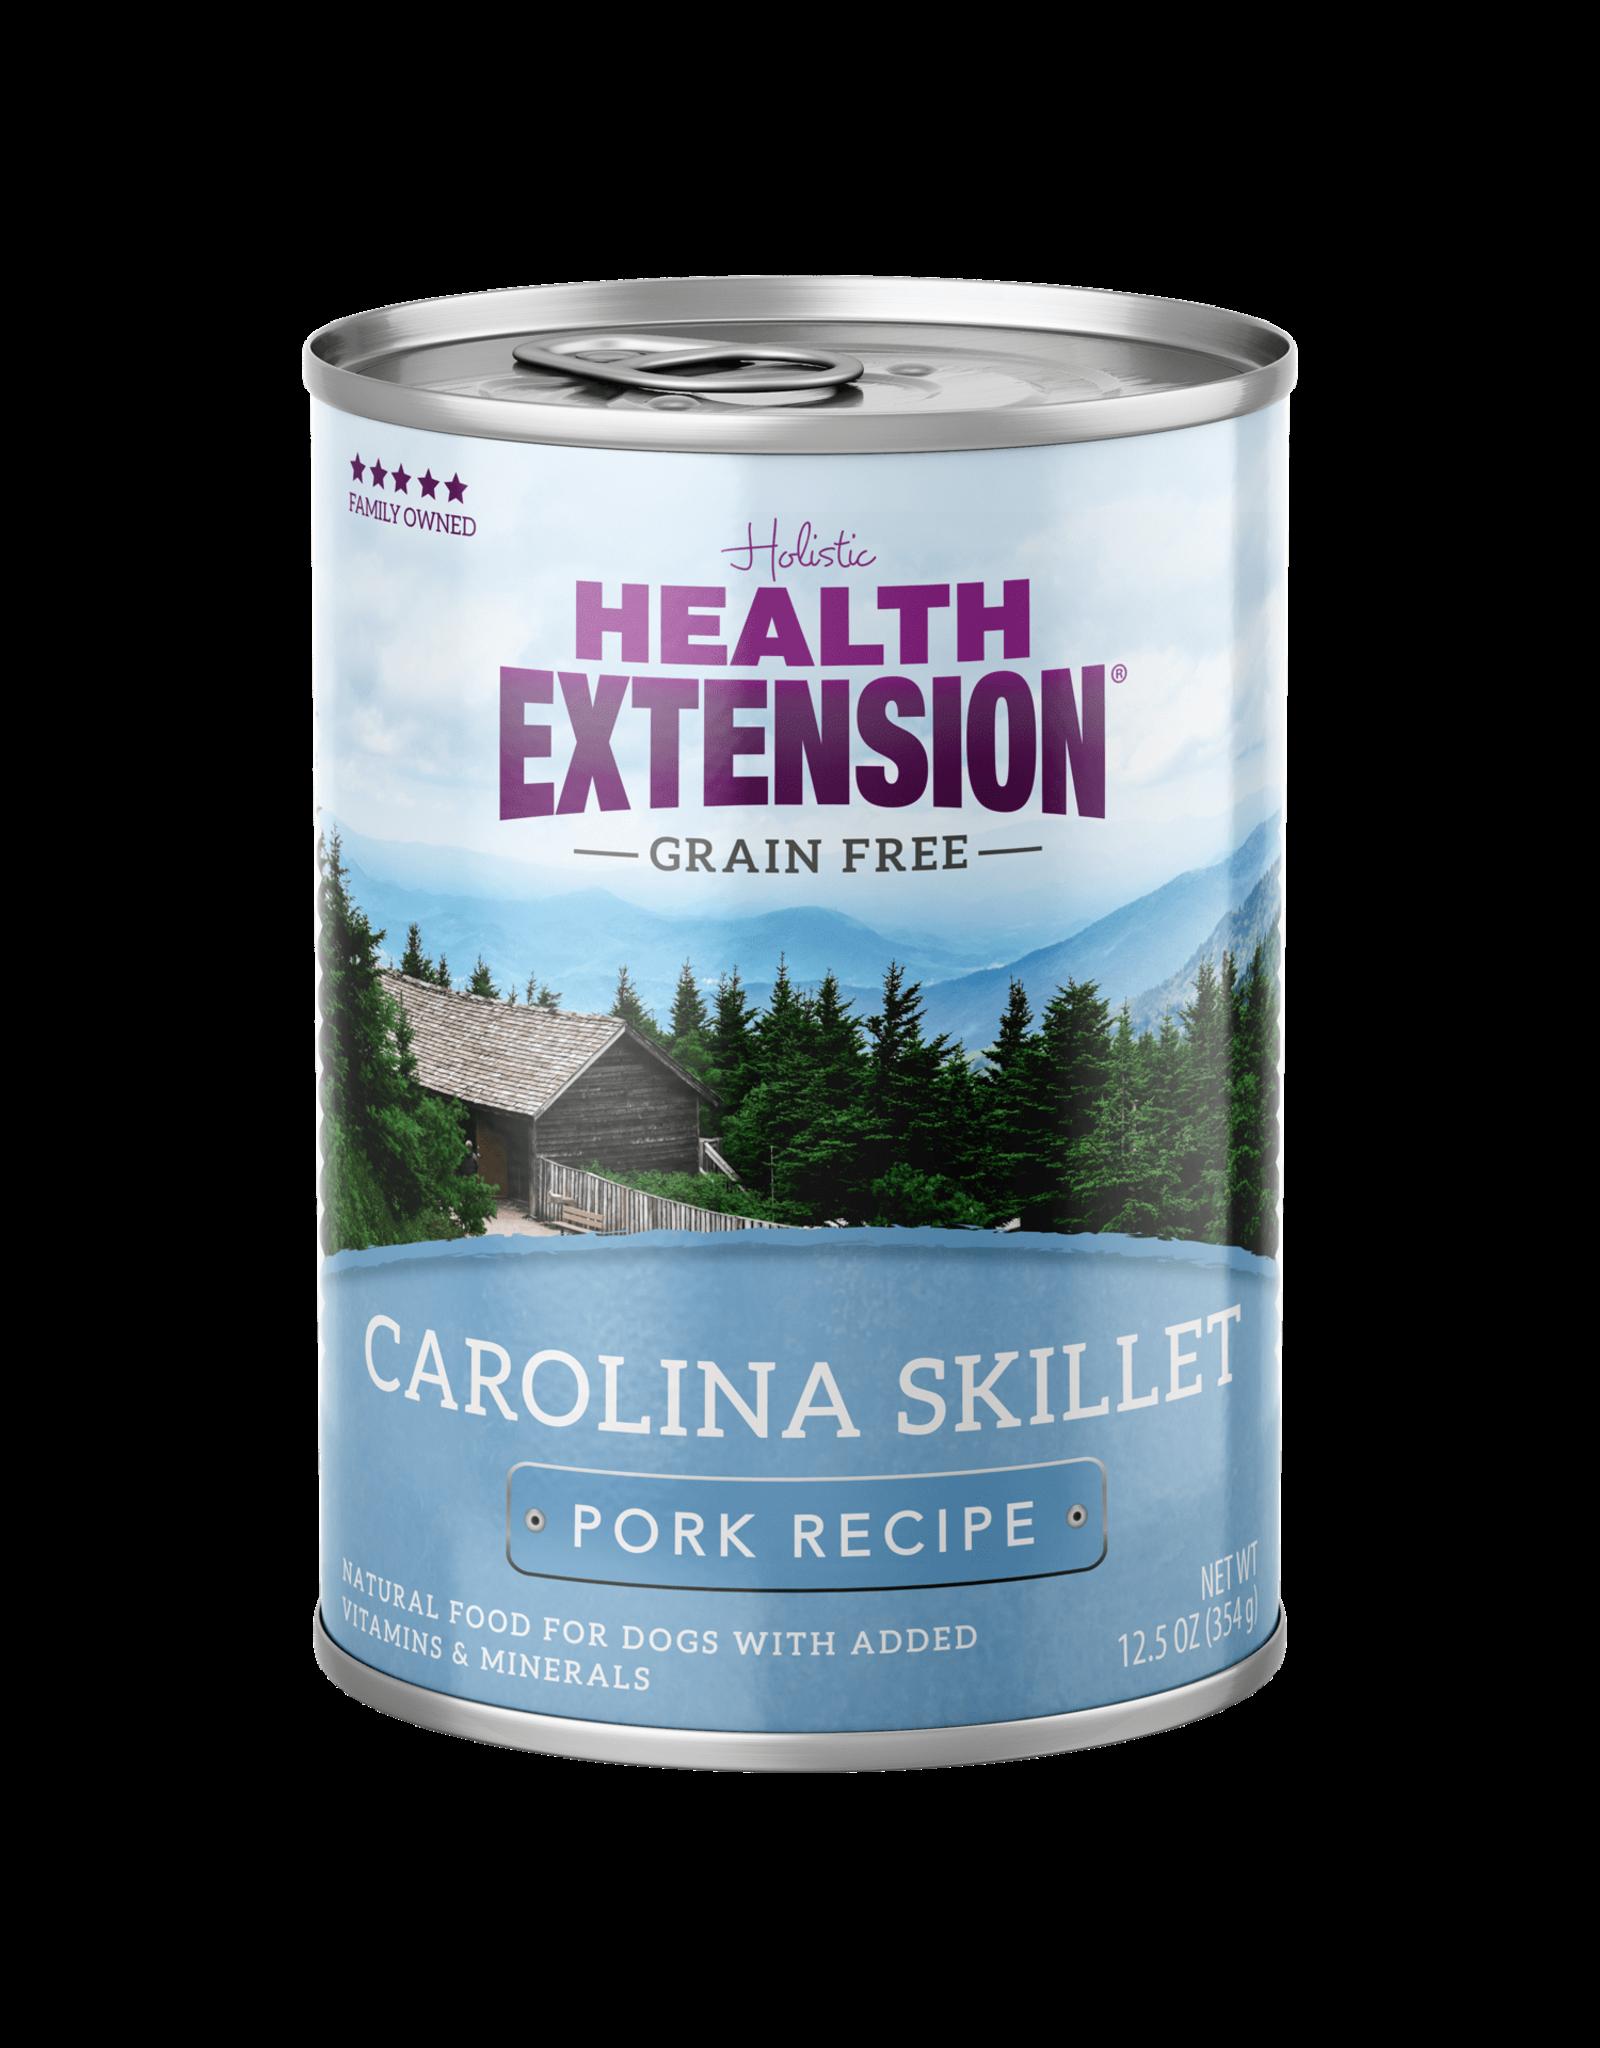 Health Extension Health Extension Wet Dog Food Carolina Skillet Pork Recipe 12.5oz Can Grain Free